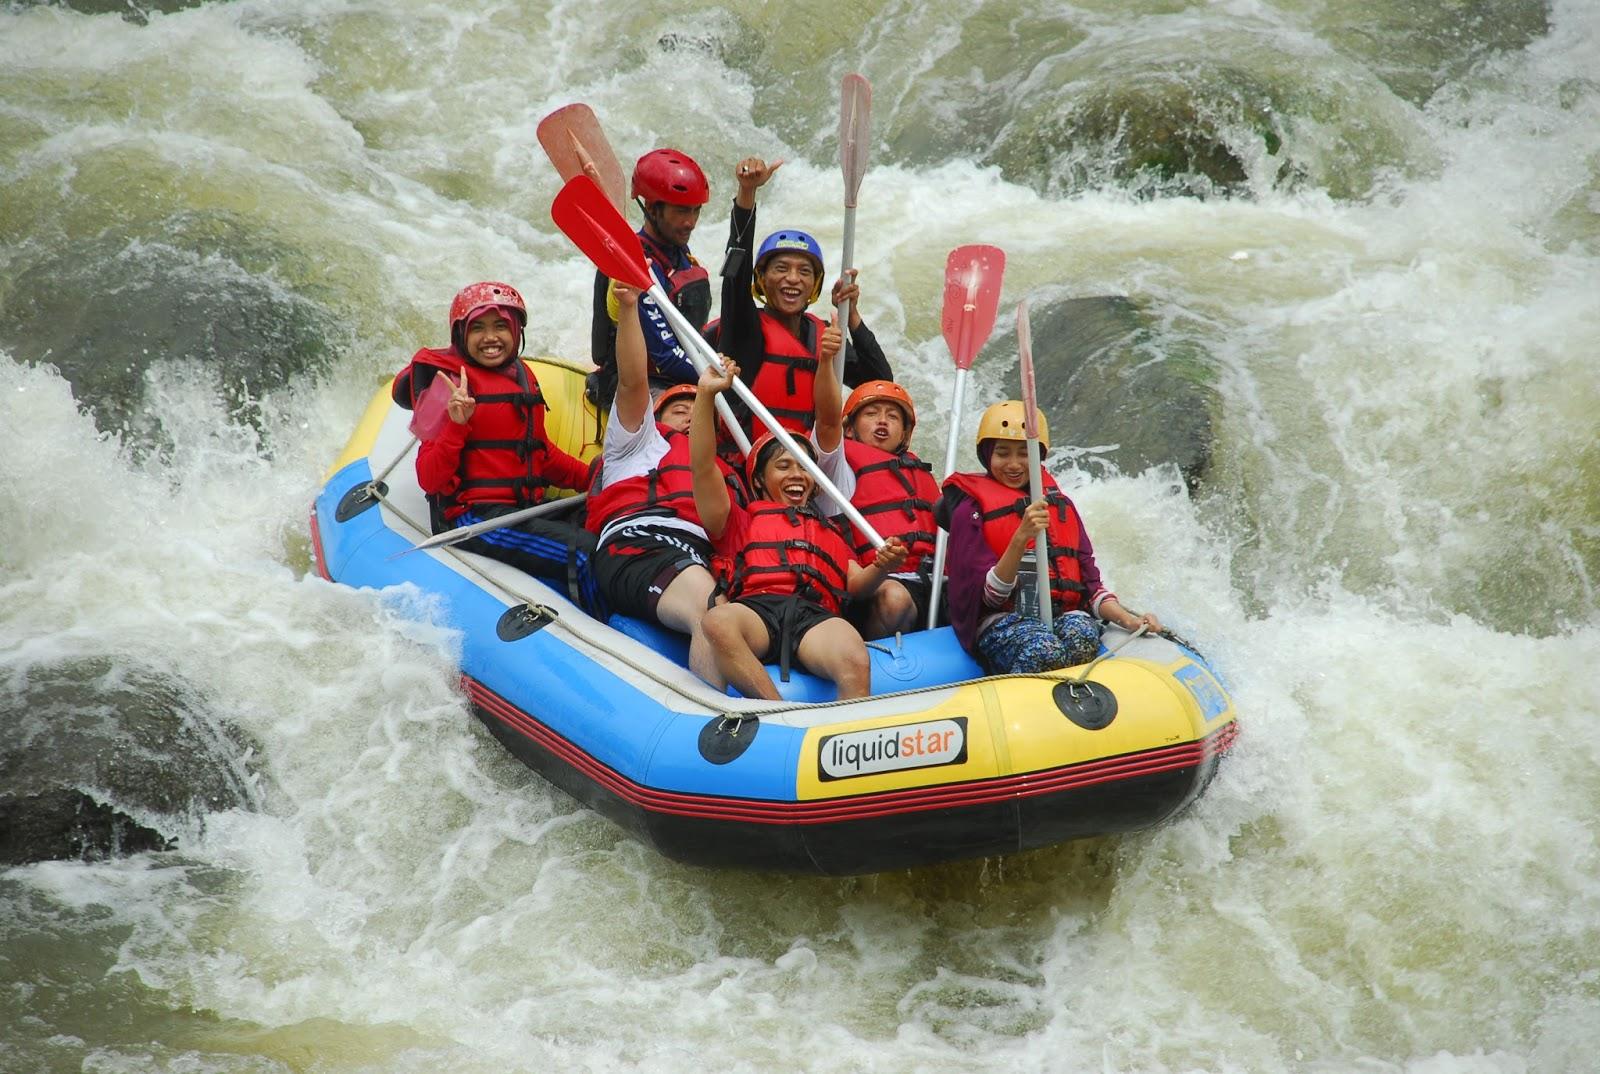 Wisata Arung Jeram Serayu Banjarnegara Menguji Adrenalin Adventure Rafting Sungai